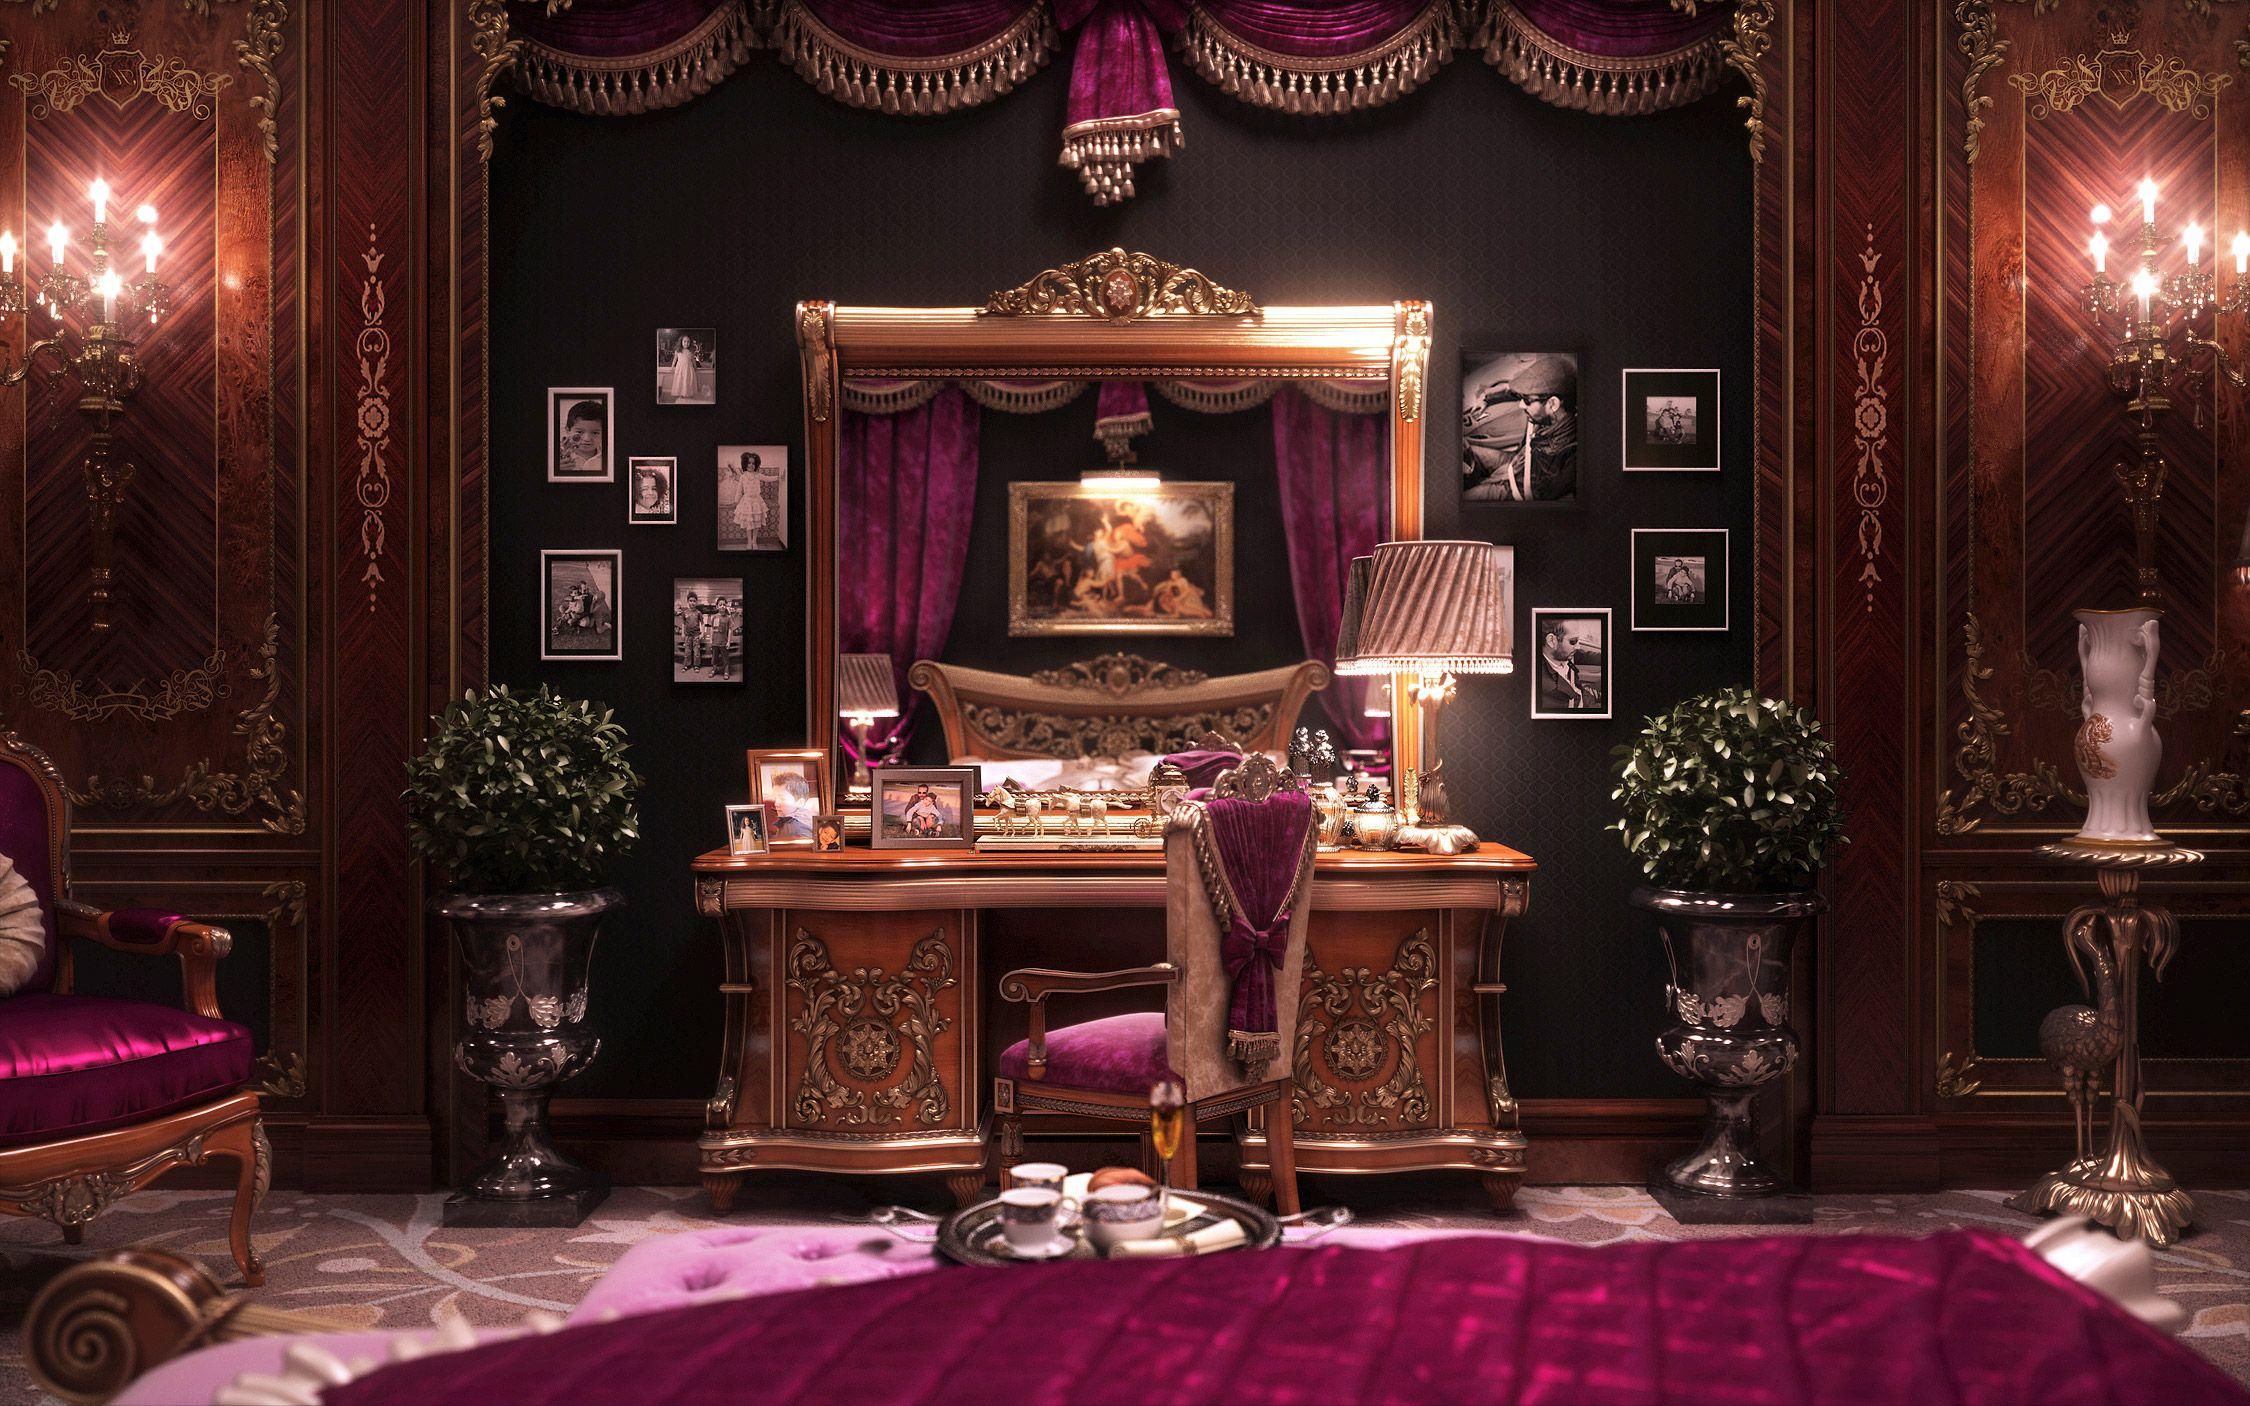 royal room - Αναζήτηση Google | Interiors and Environments ...